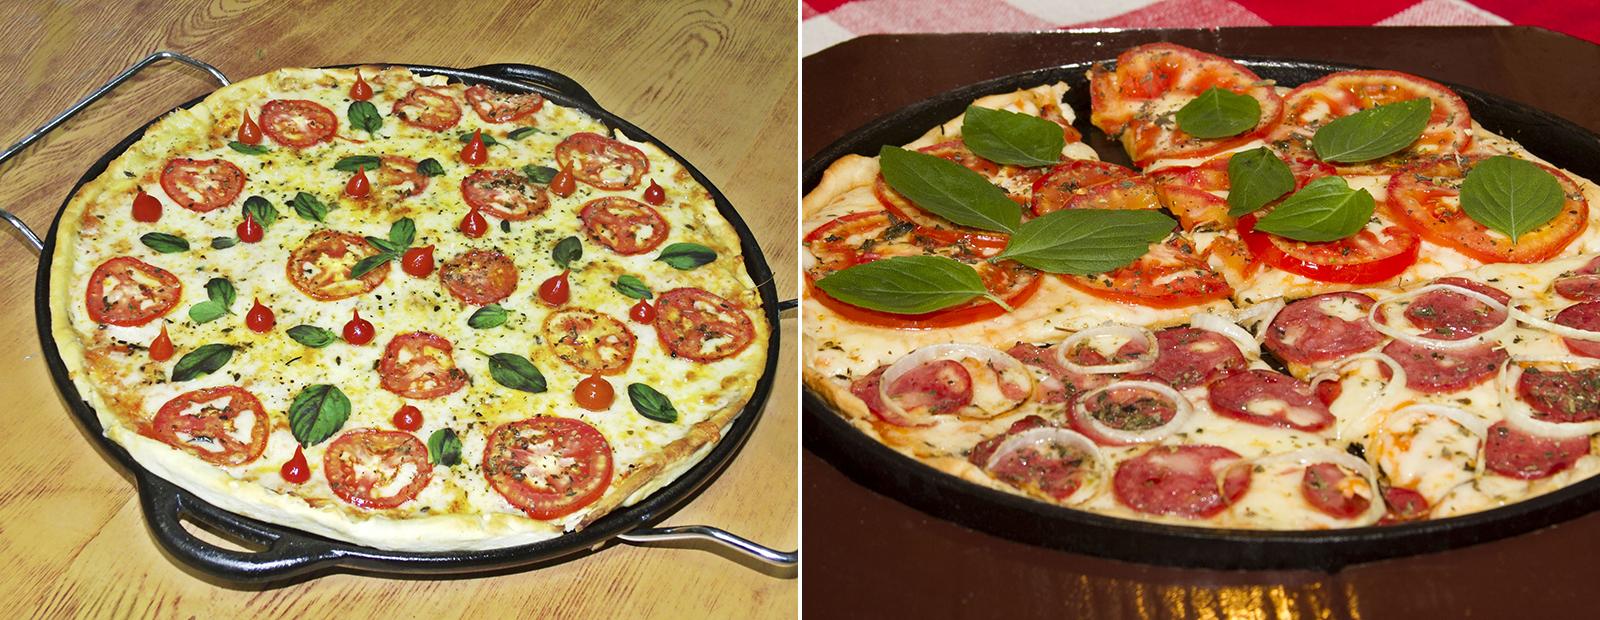 pizzasr02